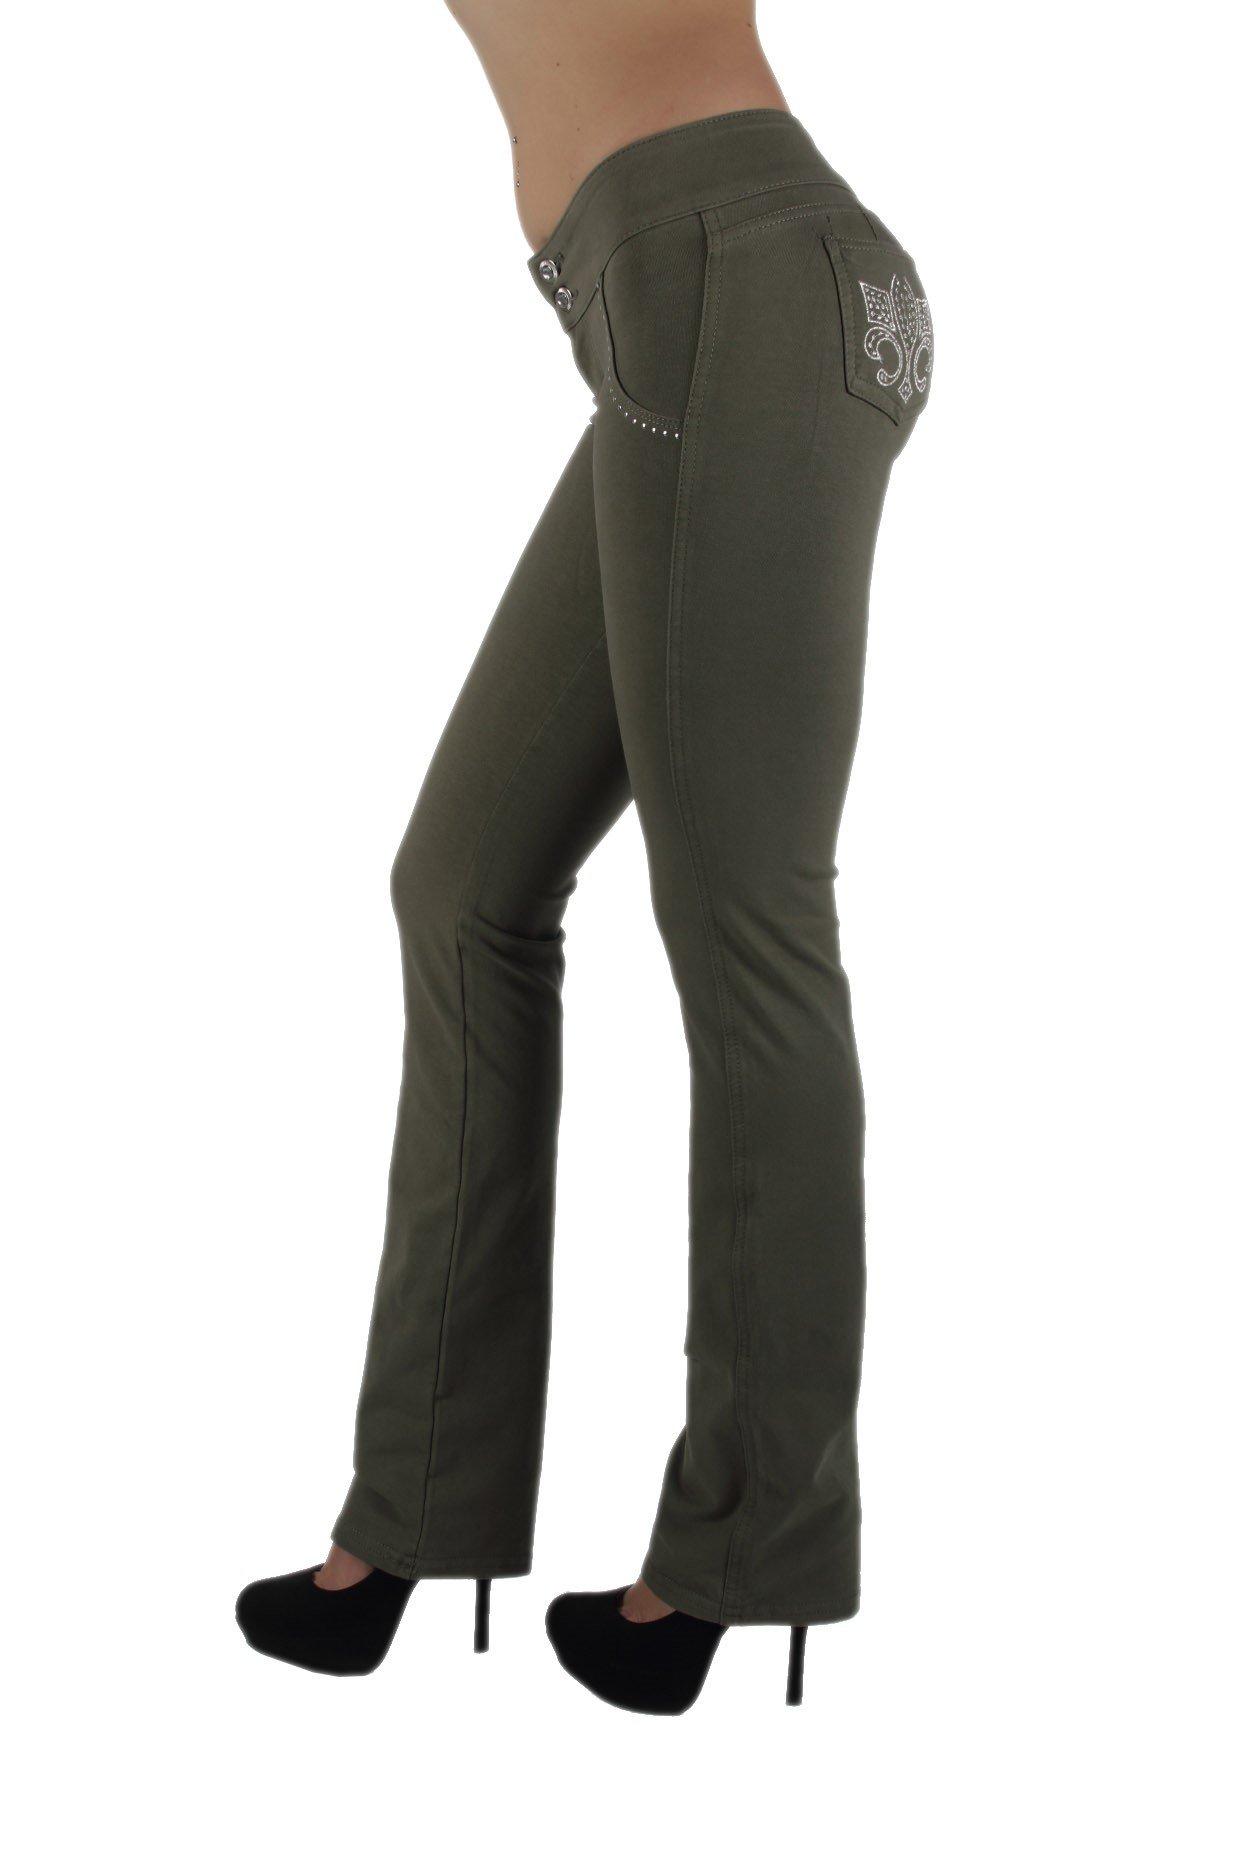 U-Turn Jeans 3033 - Brazilian Style Butt Lift, Levanta Cola, Fashion Moleton, Boot Leg in Olive Size L